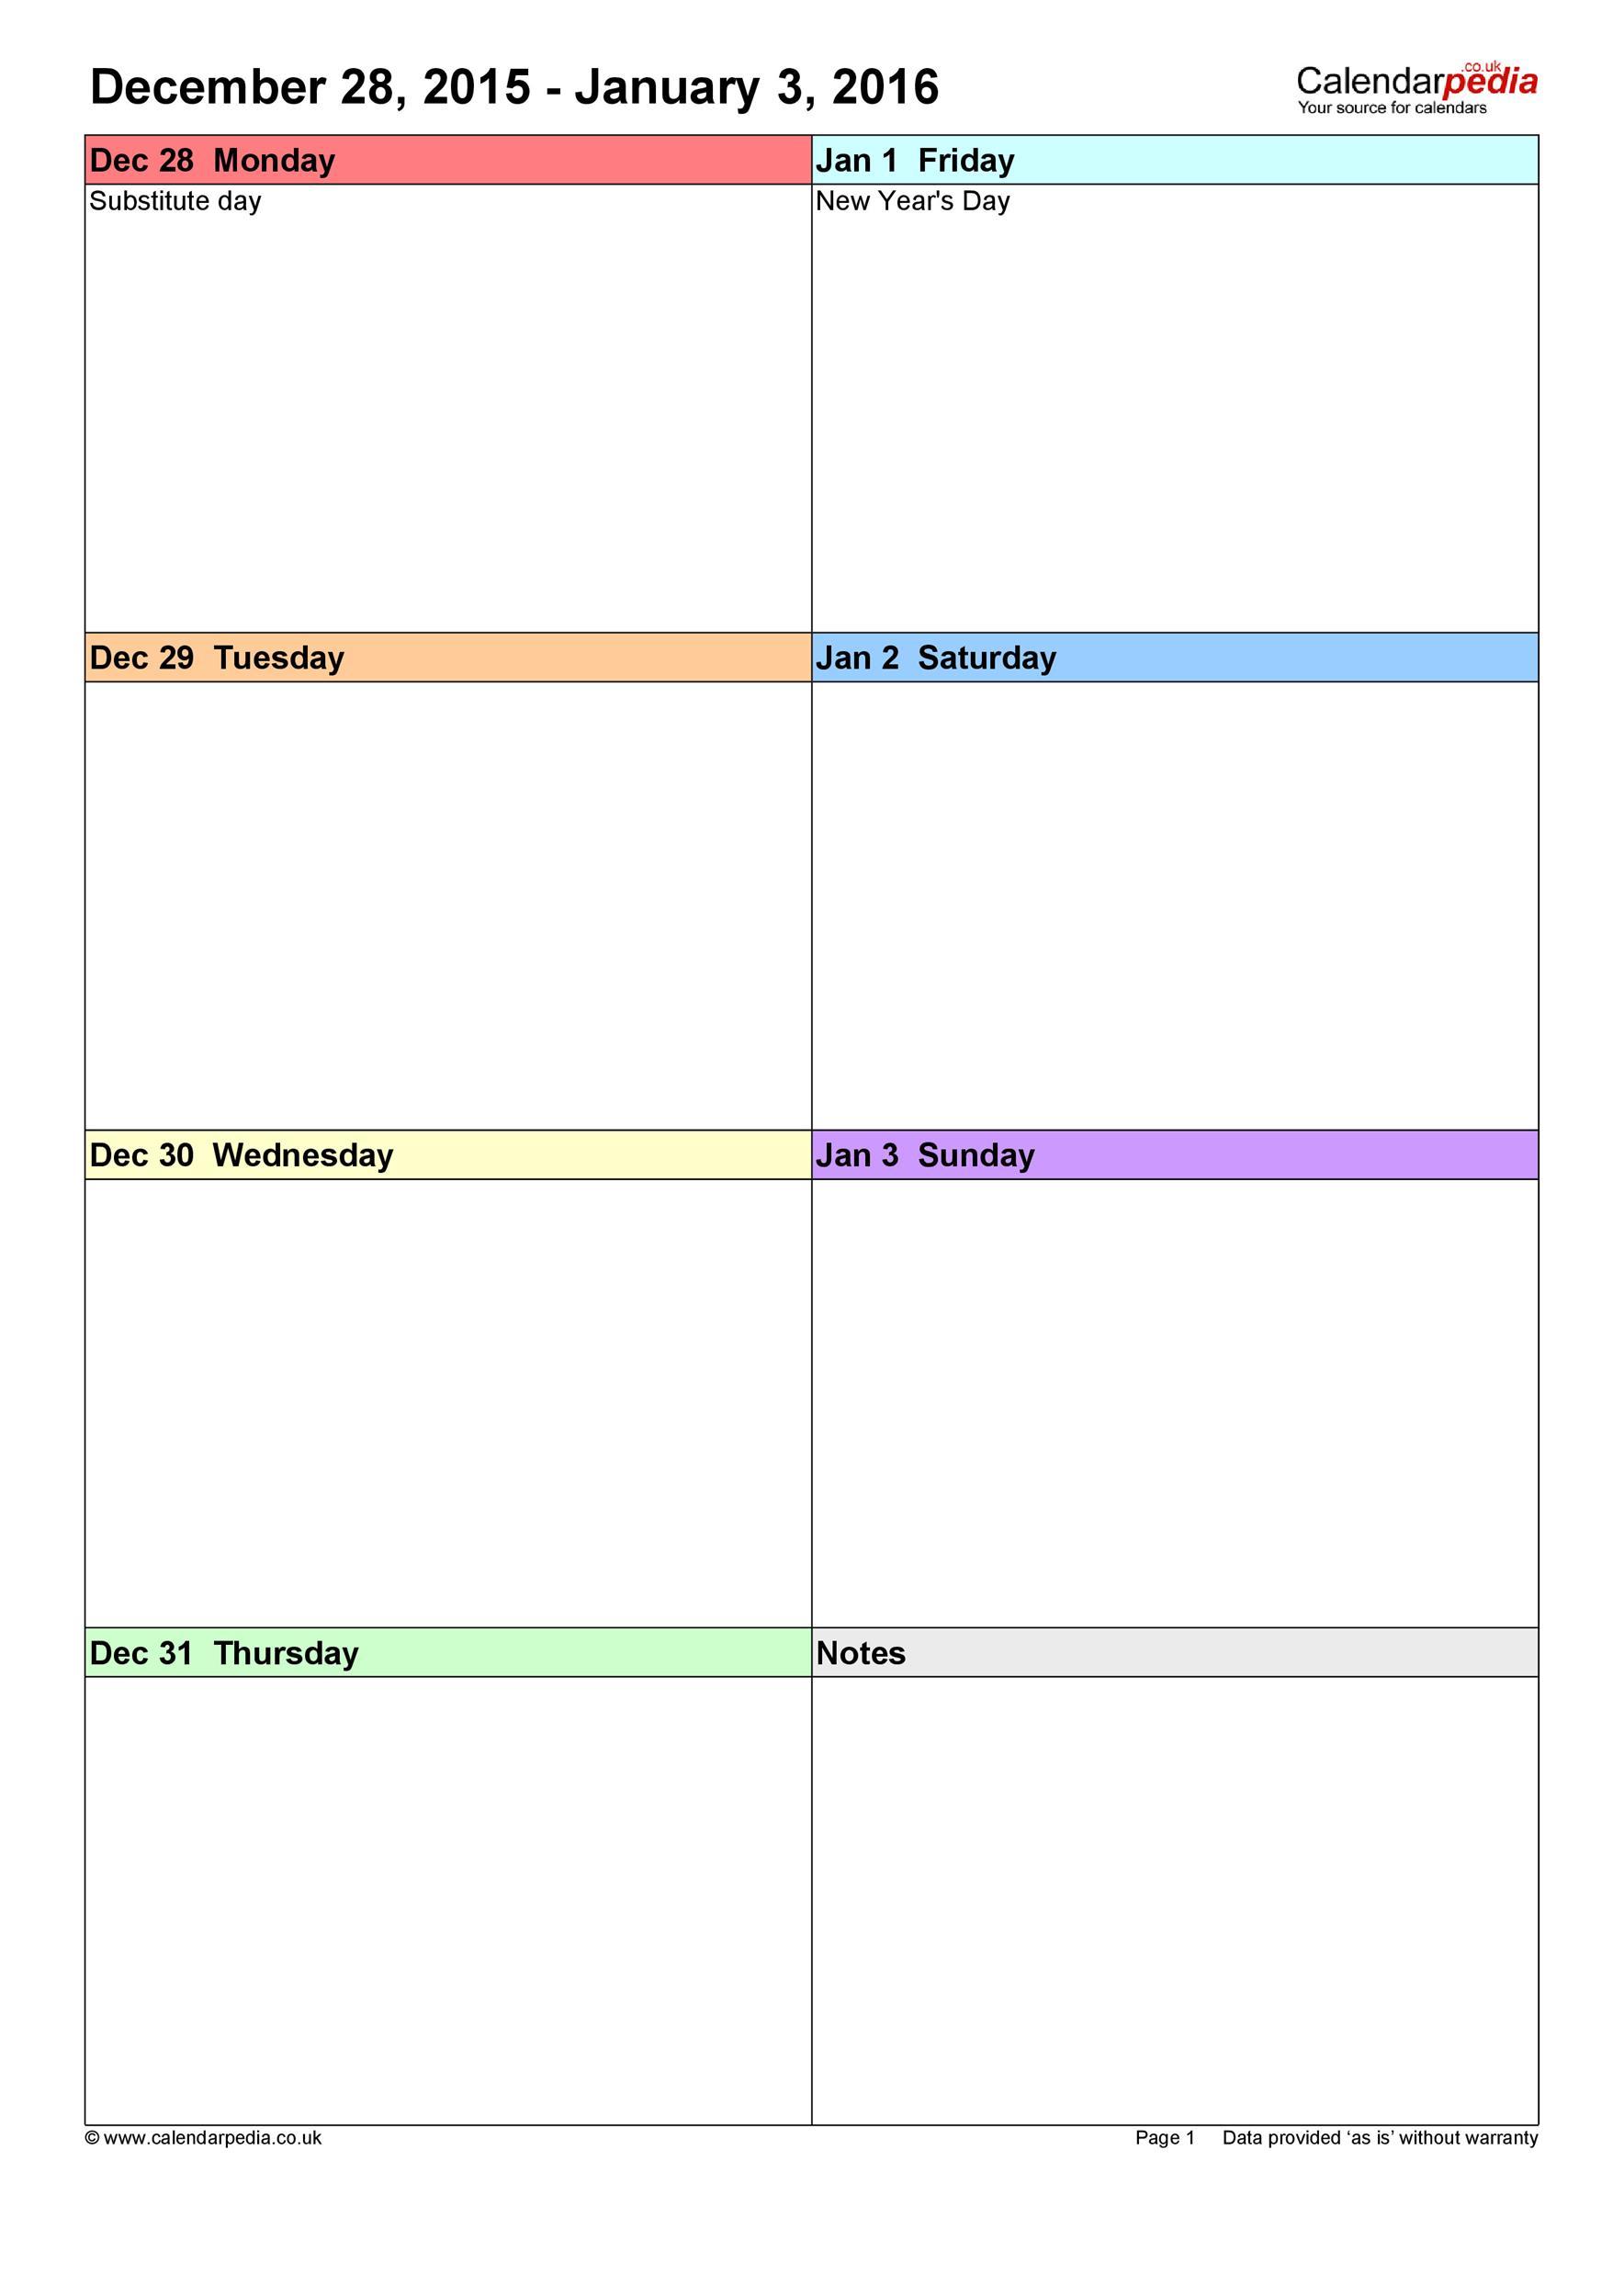 26 Blank Weekly Calendar Templates [Pdf Excel Word] ᐅ